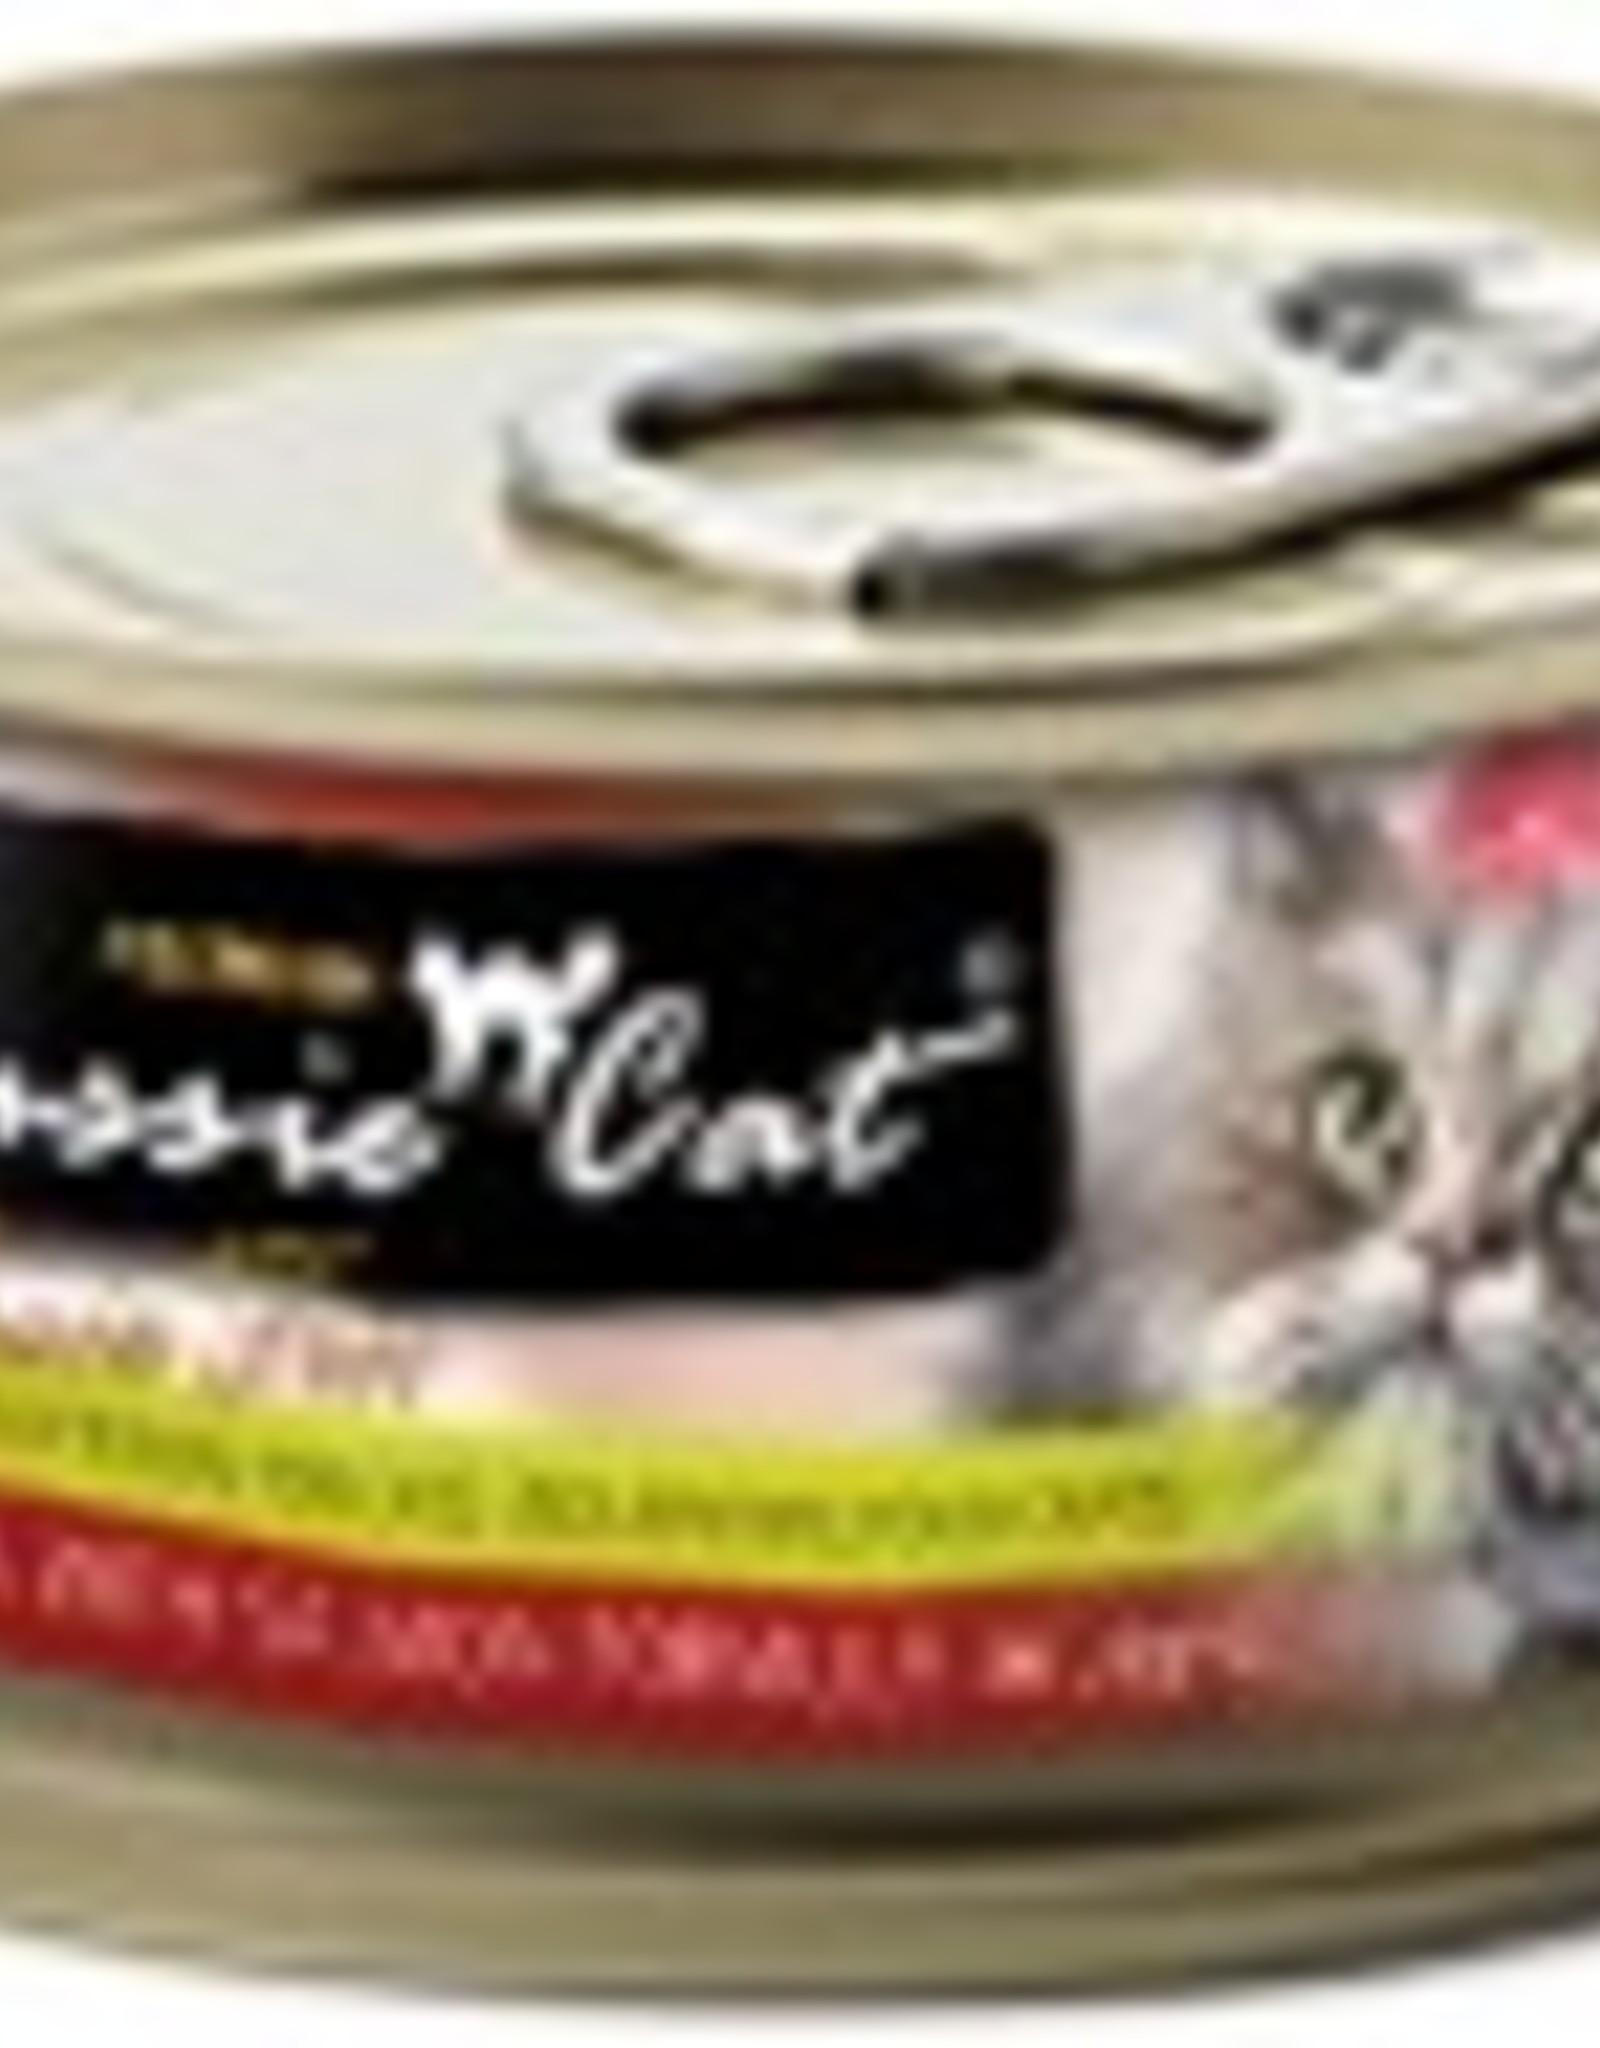 Fussie Cat Premium Tuna with Salmon Formula in Aspic Grain-Free Canned Cat Food, 2.82 oz.